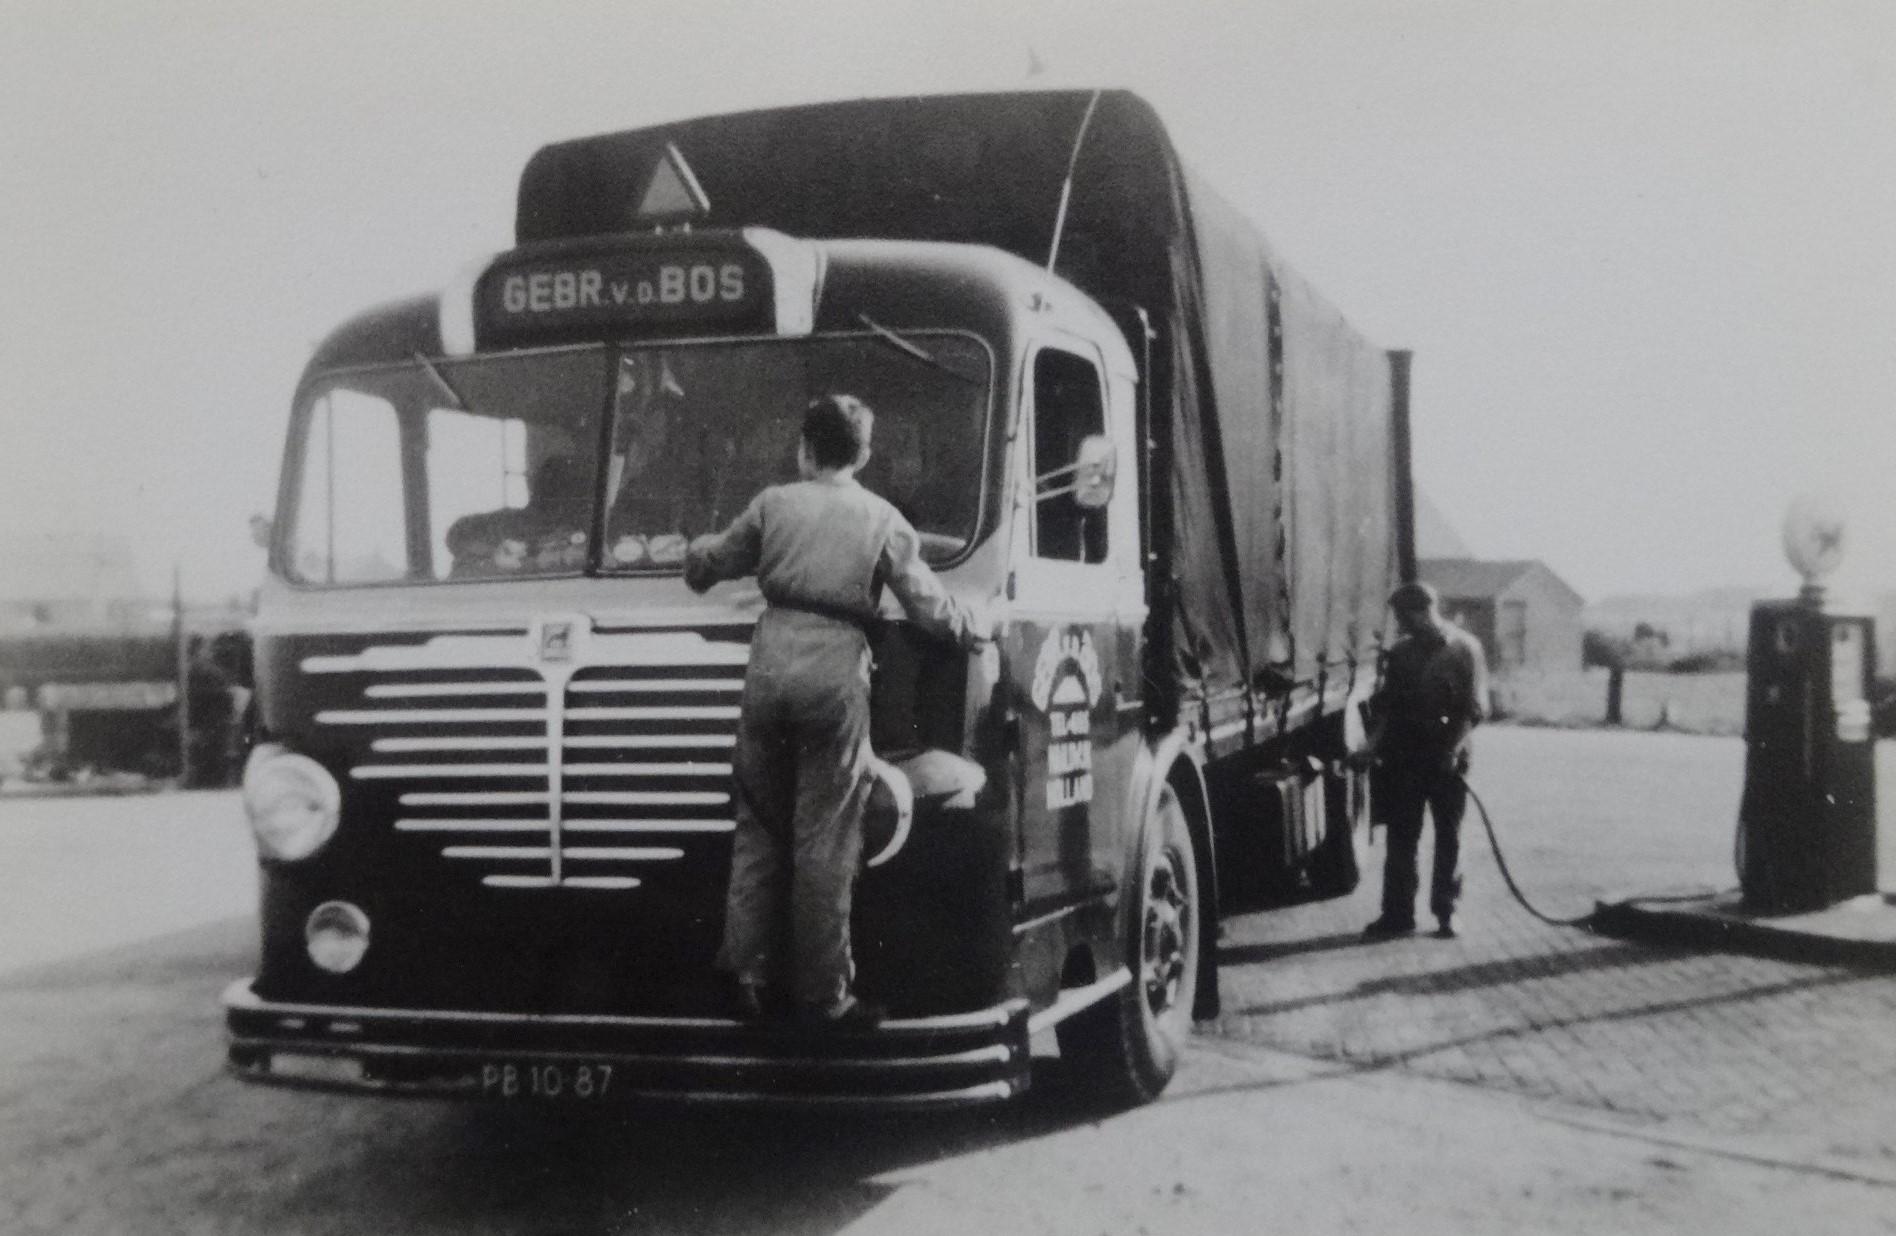 Bussing-Bert-Klanderman-archief-1